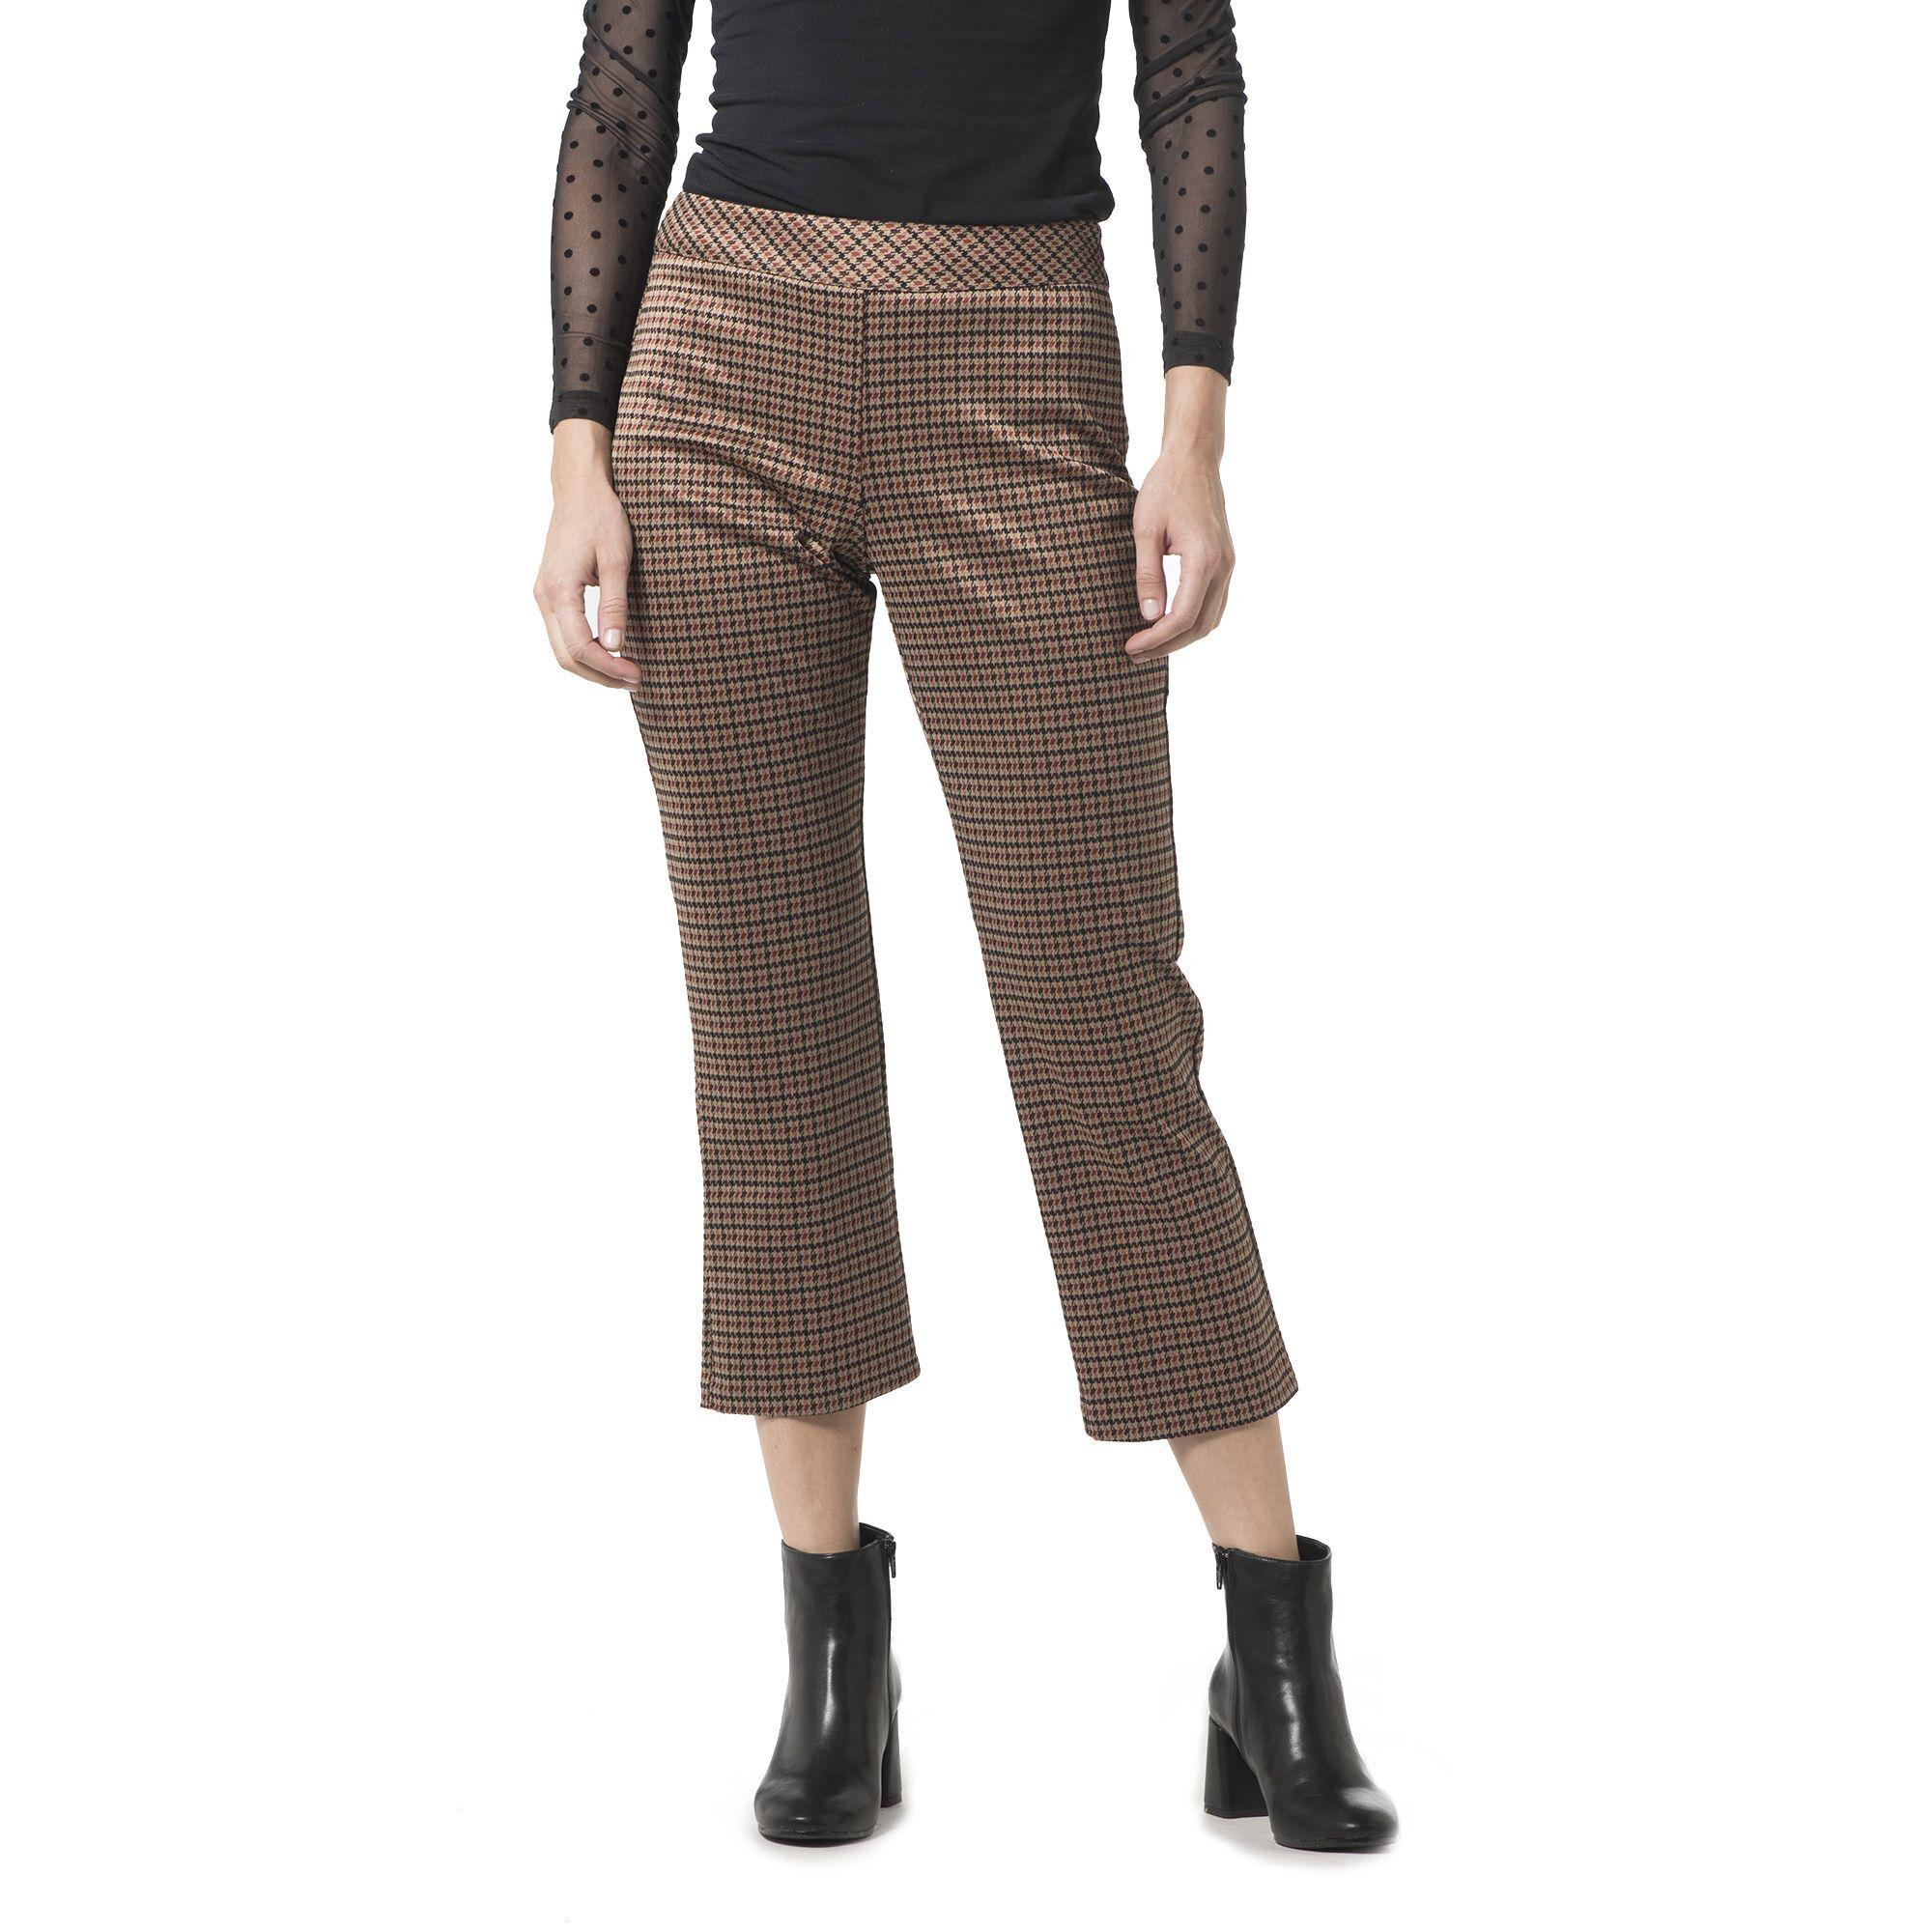 Officina della Moda Pantalone gaucho made in Italy